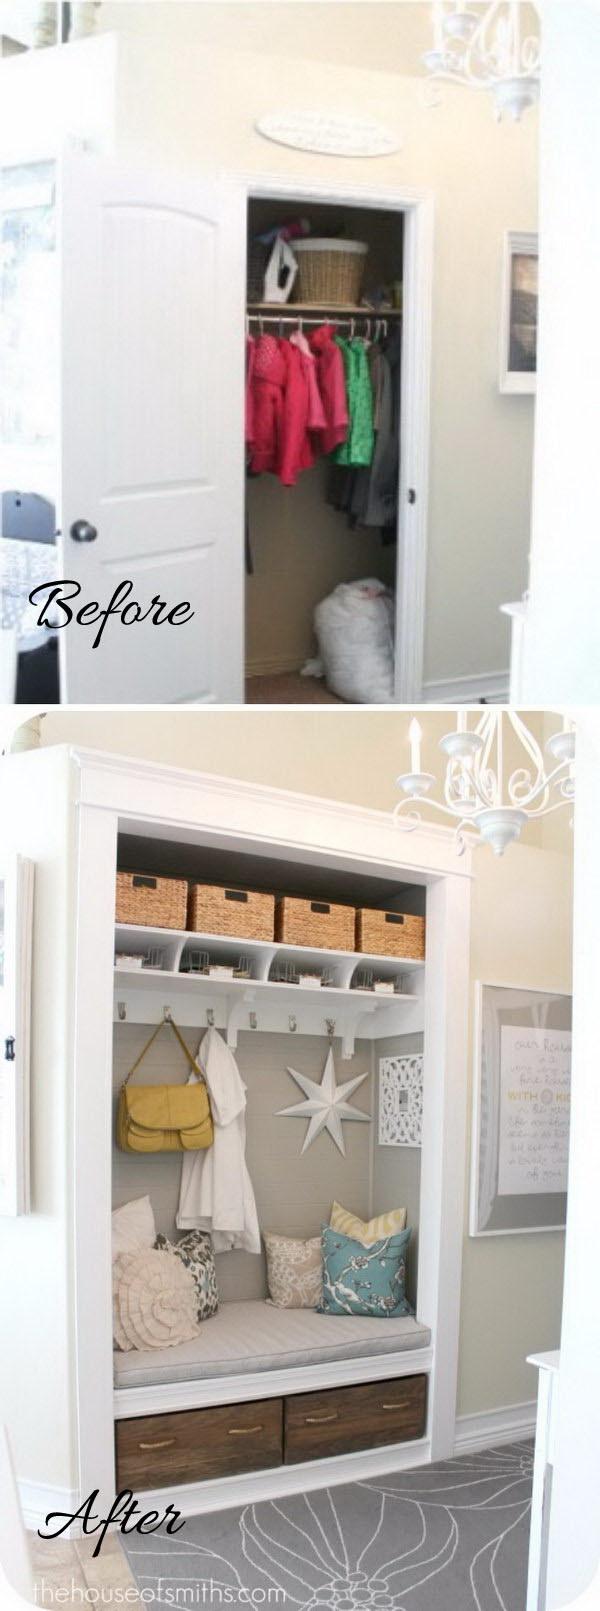 2 entryway makeover diy ideas tutorials - 30+ DIY Ideas to Give a Makeover to a Your Entryway